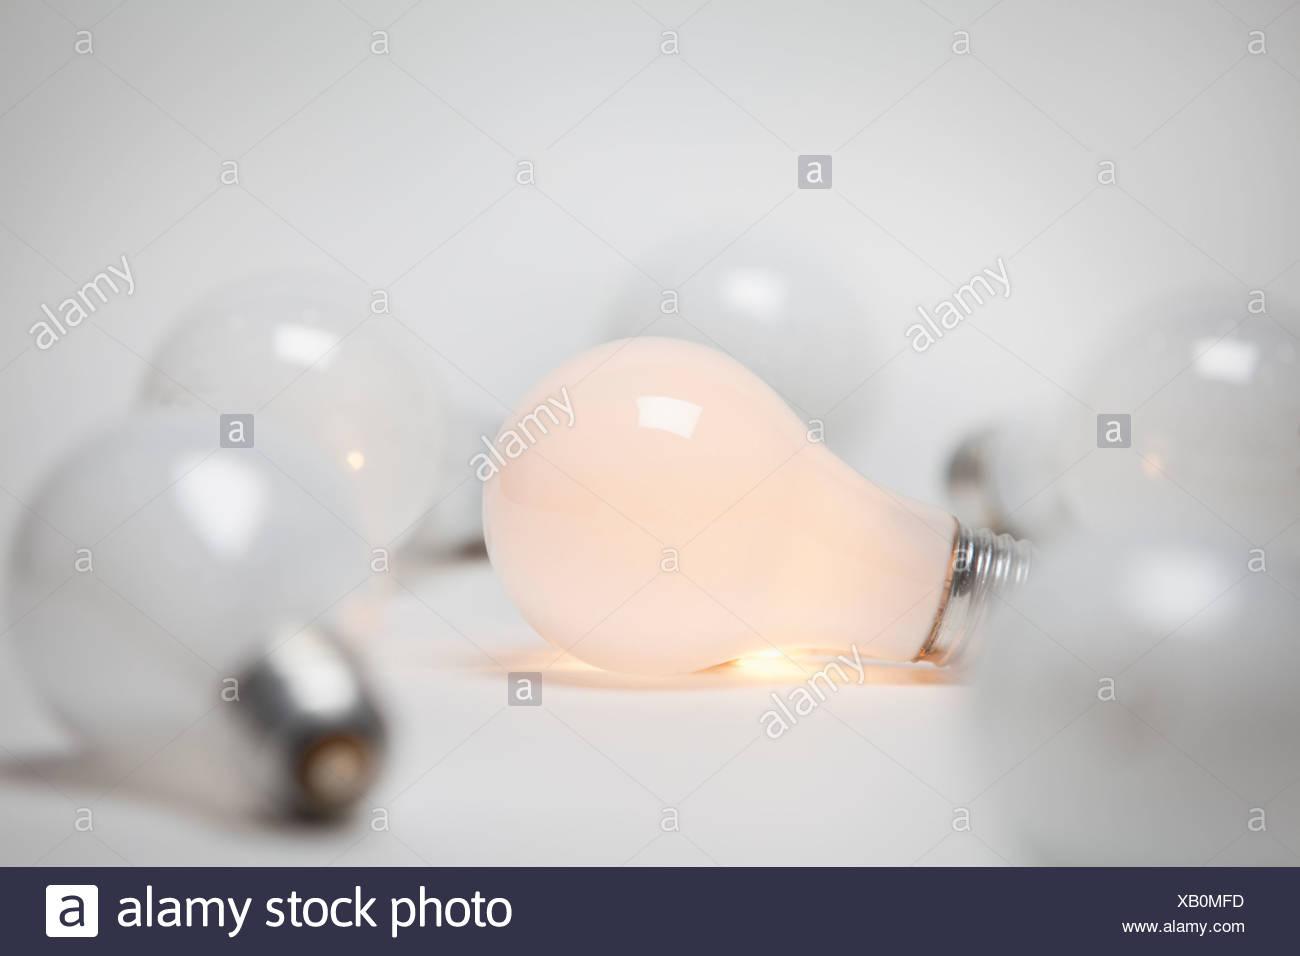 Studio shot of light bulbs - Stock Image